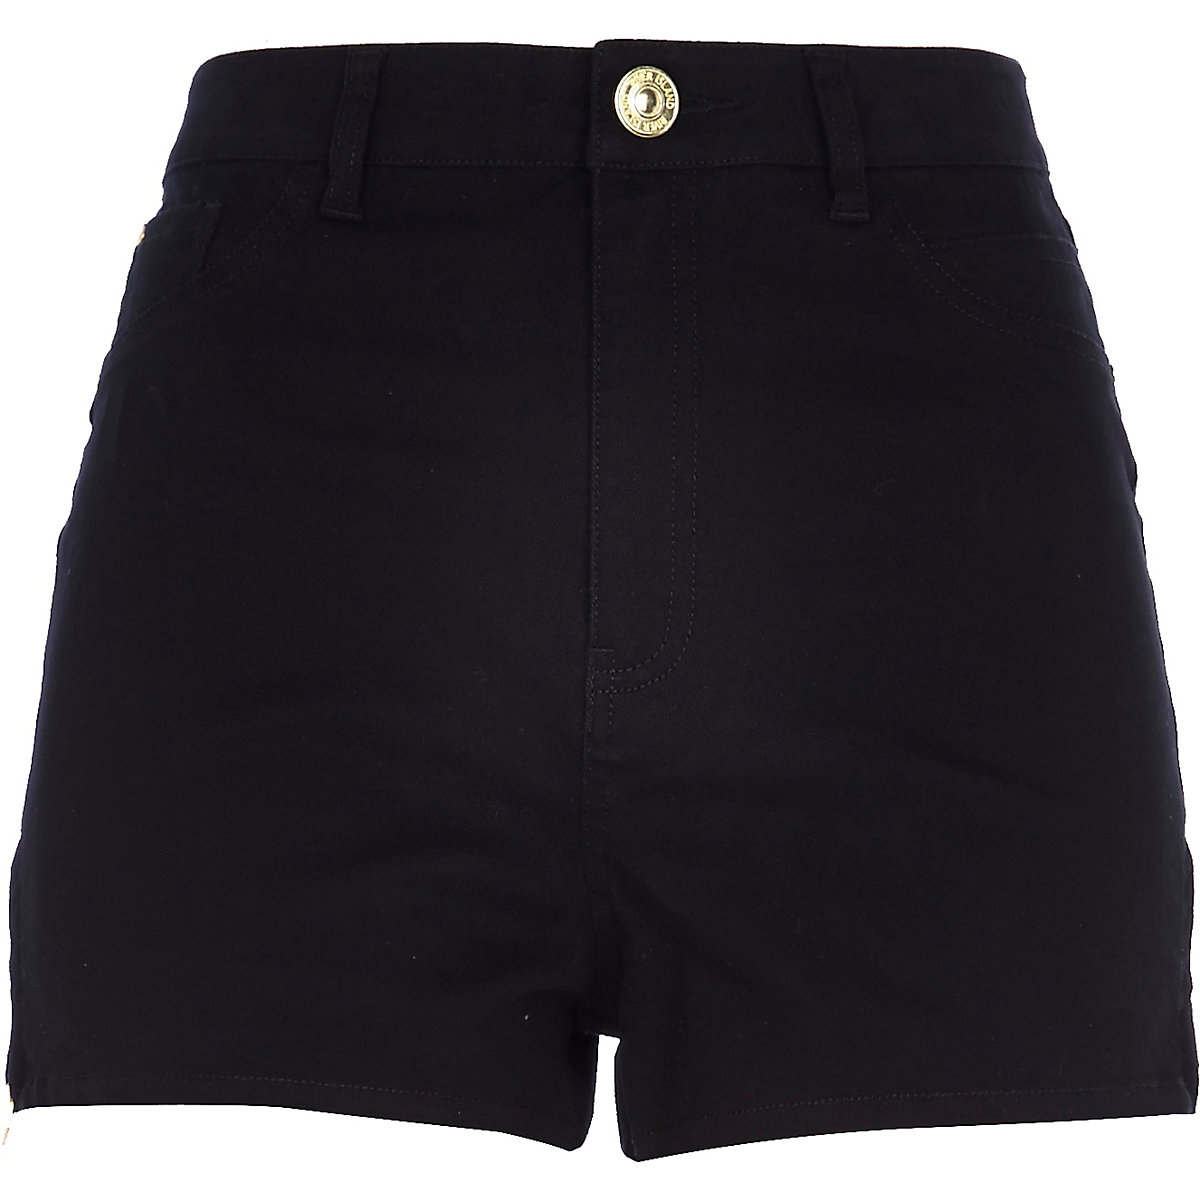 Short Nori en jean noir taille haute - Shorts - Promos - Femme da853151016